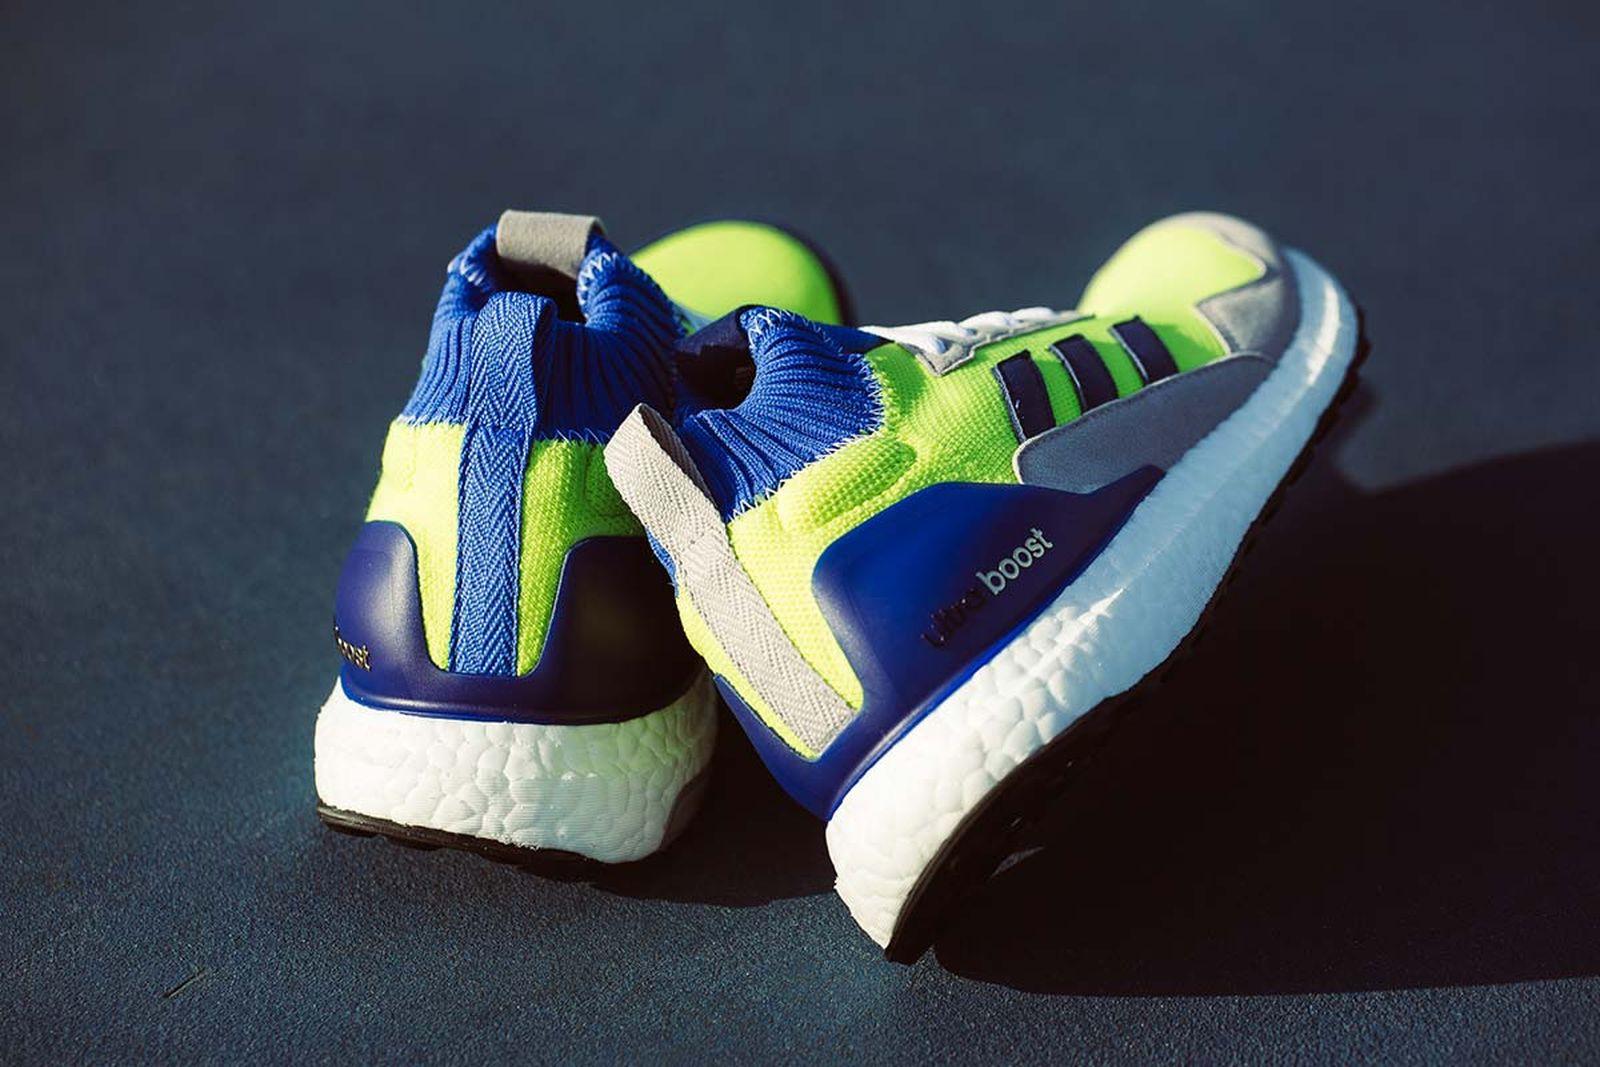 adidas-consortium-ultraboost-mid-prototype-release-date-price-07